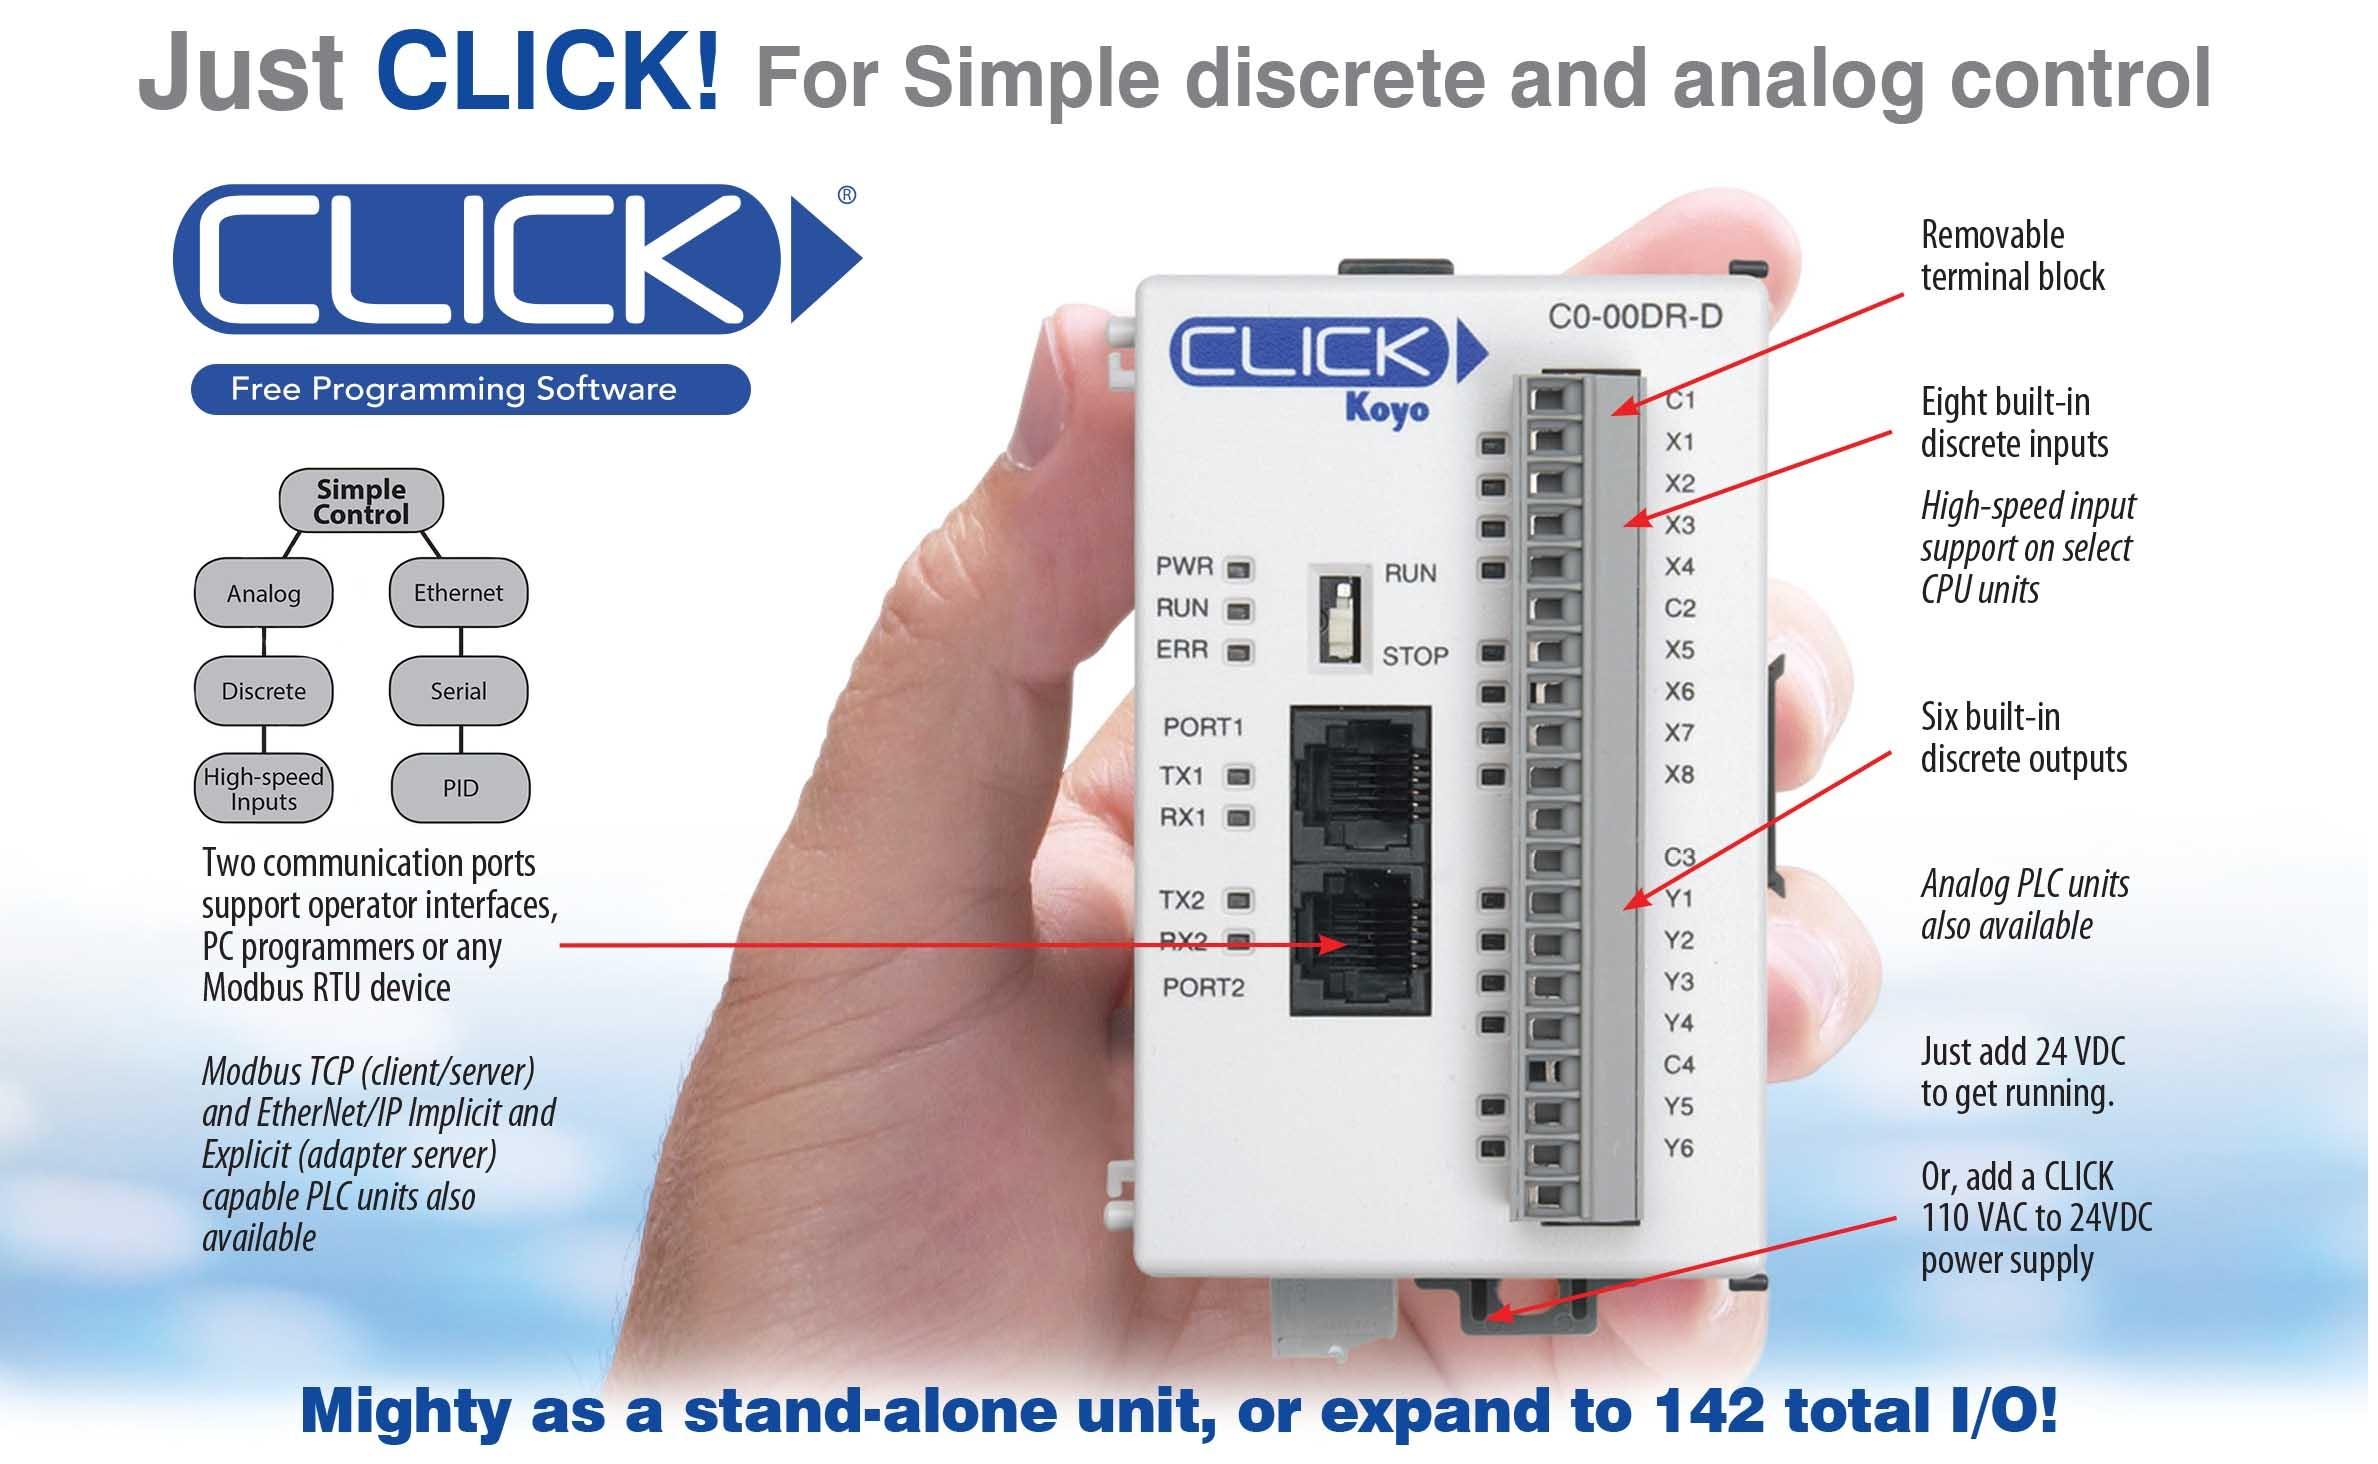 CLICK CPU features